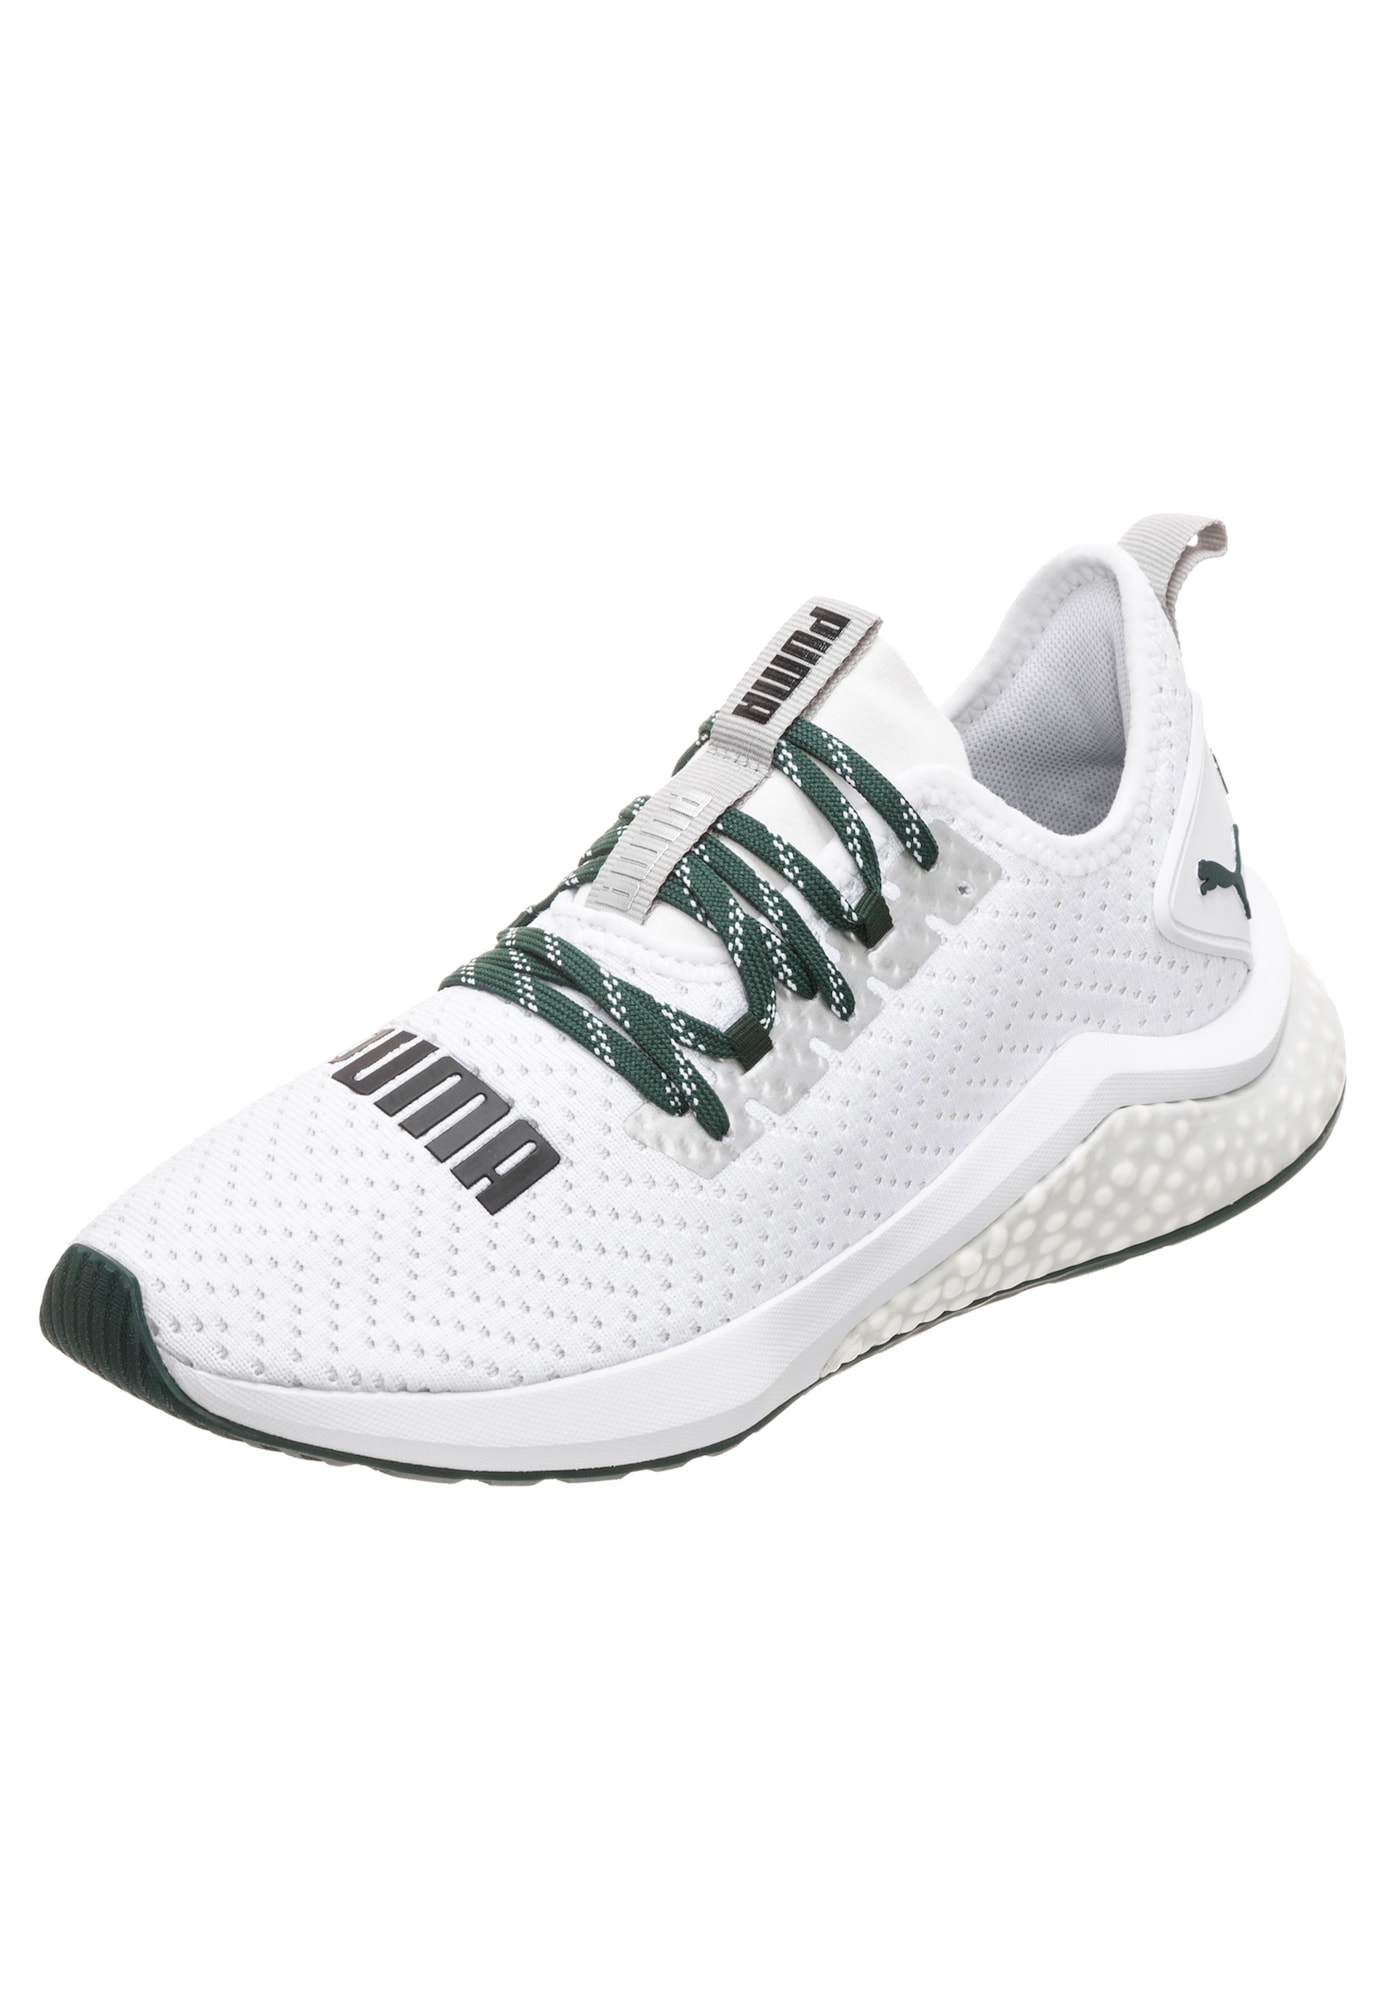 Běžecká obuv Hybrid Nx Tz tmavě zelená bílá PUMA